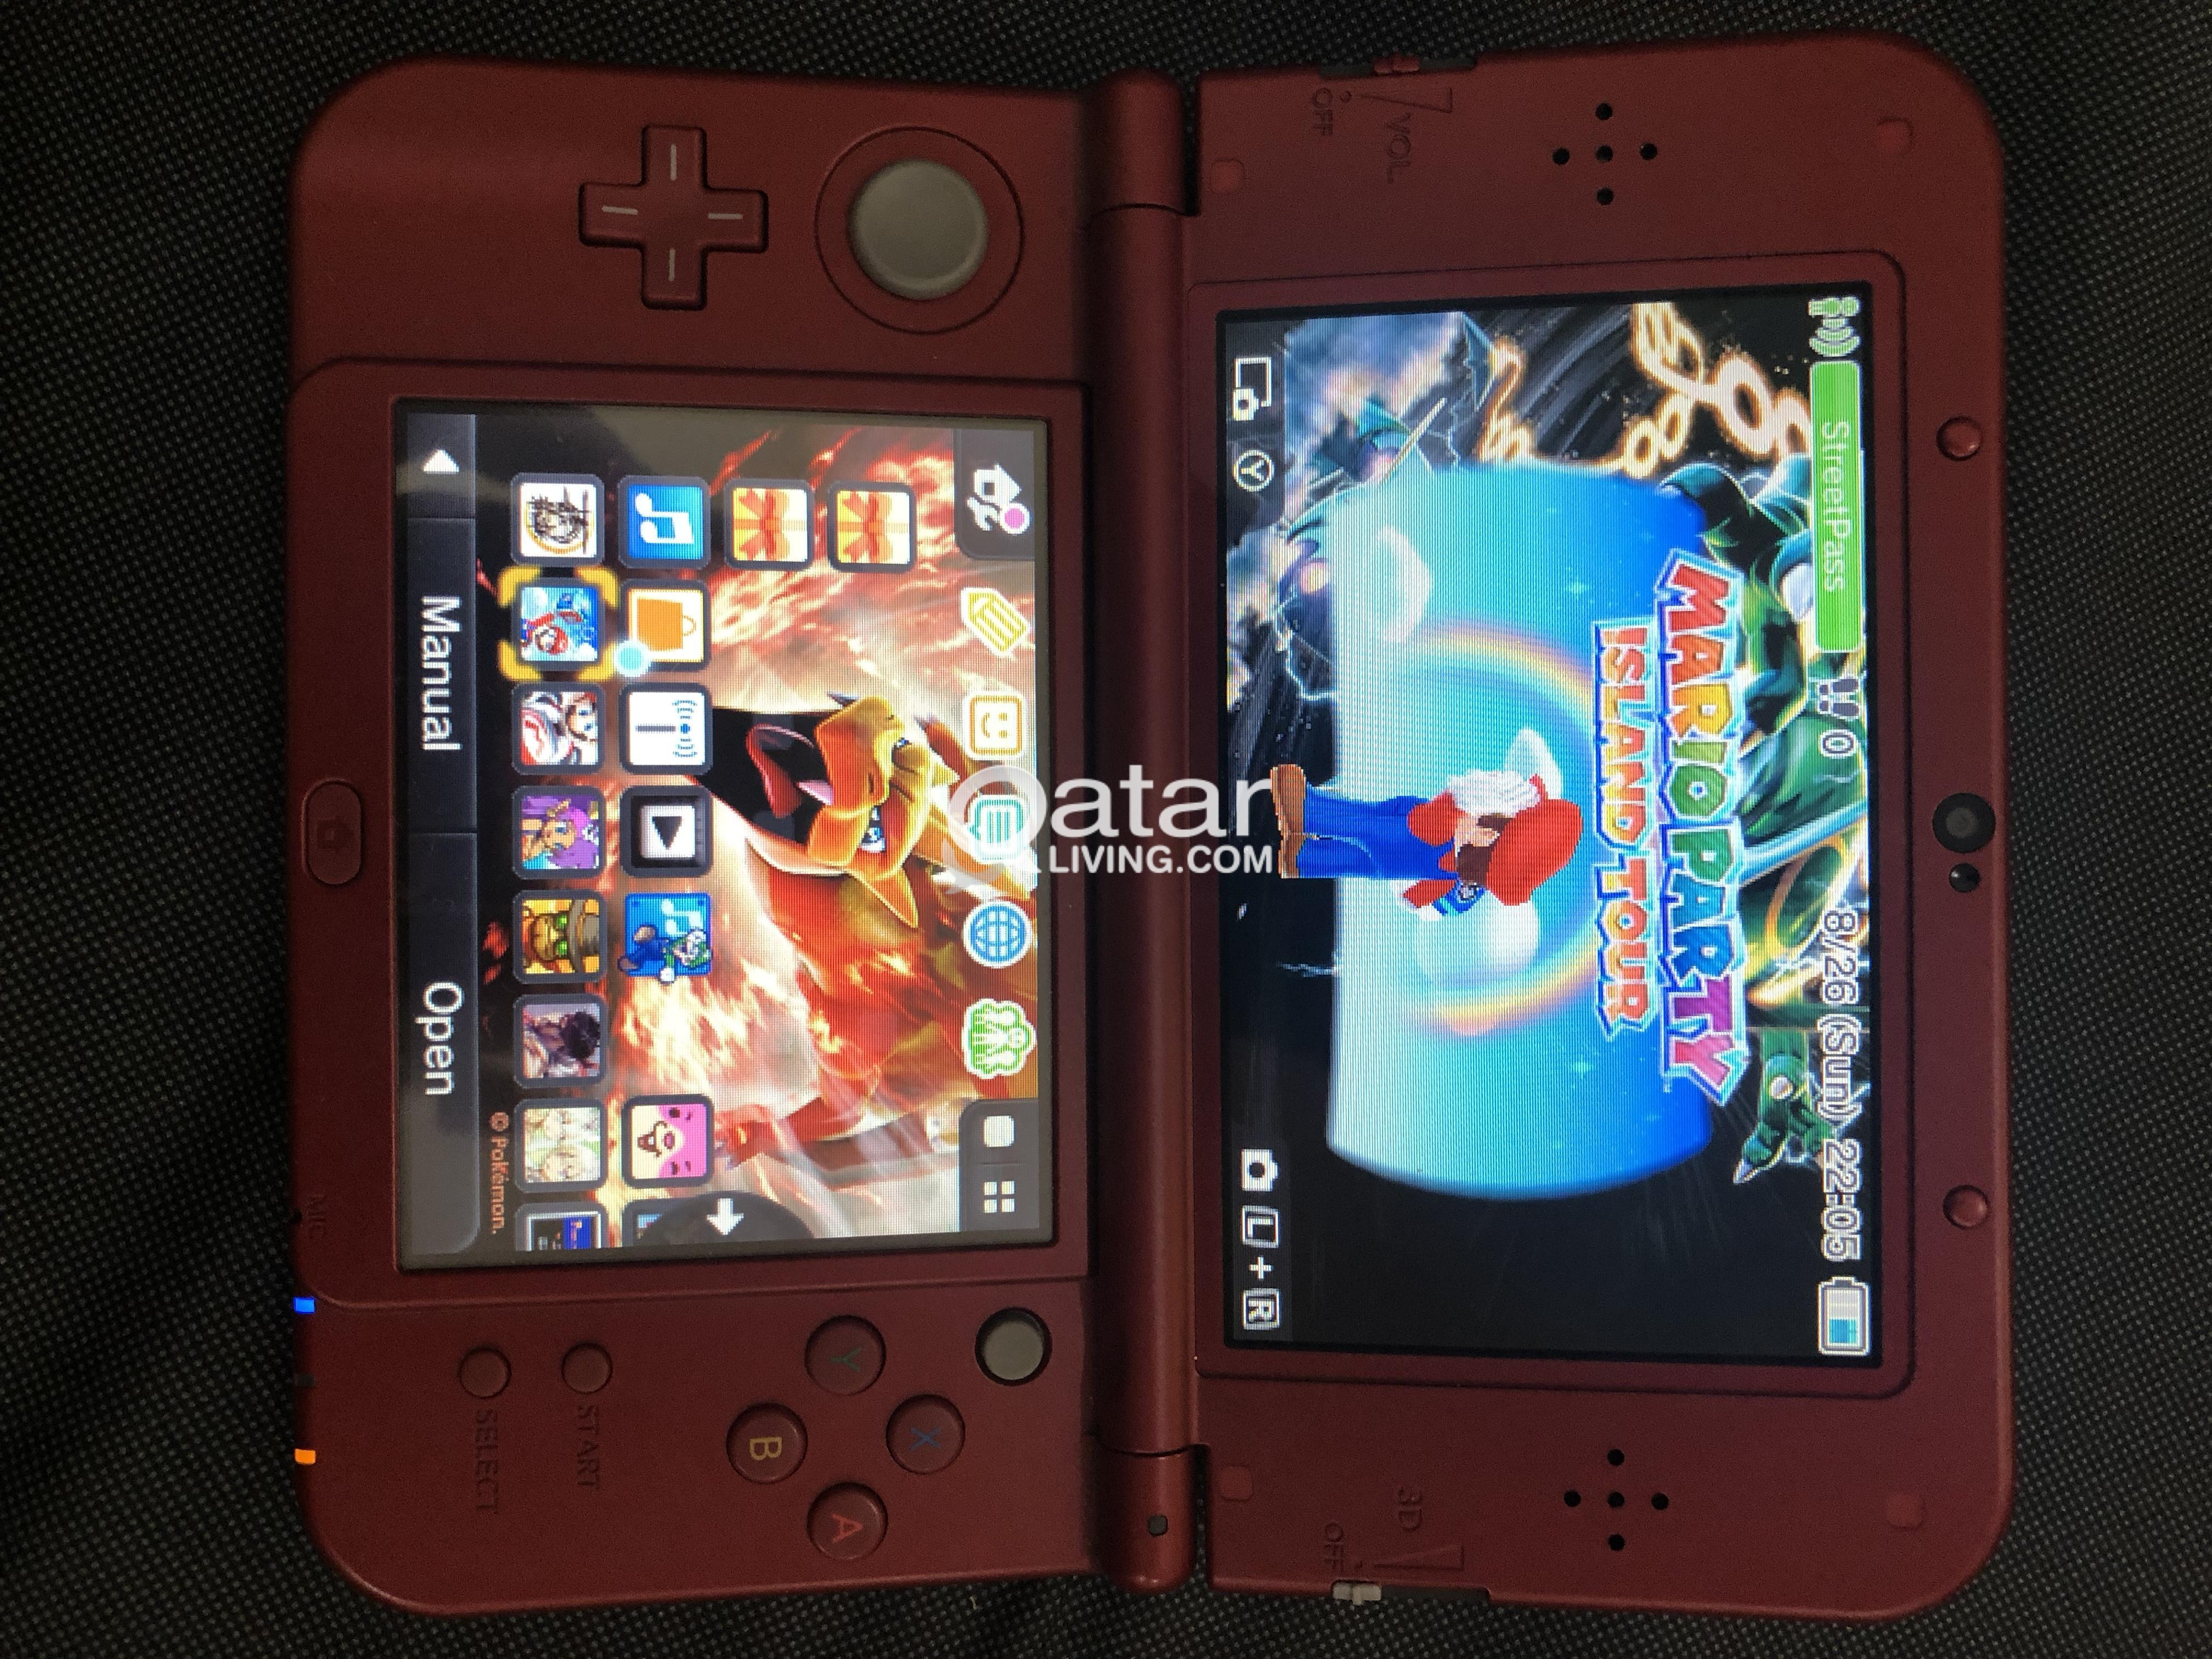 New Nintendo 3ds XL | Qatar Living